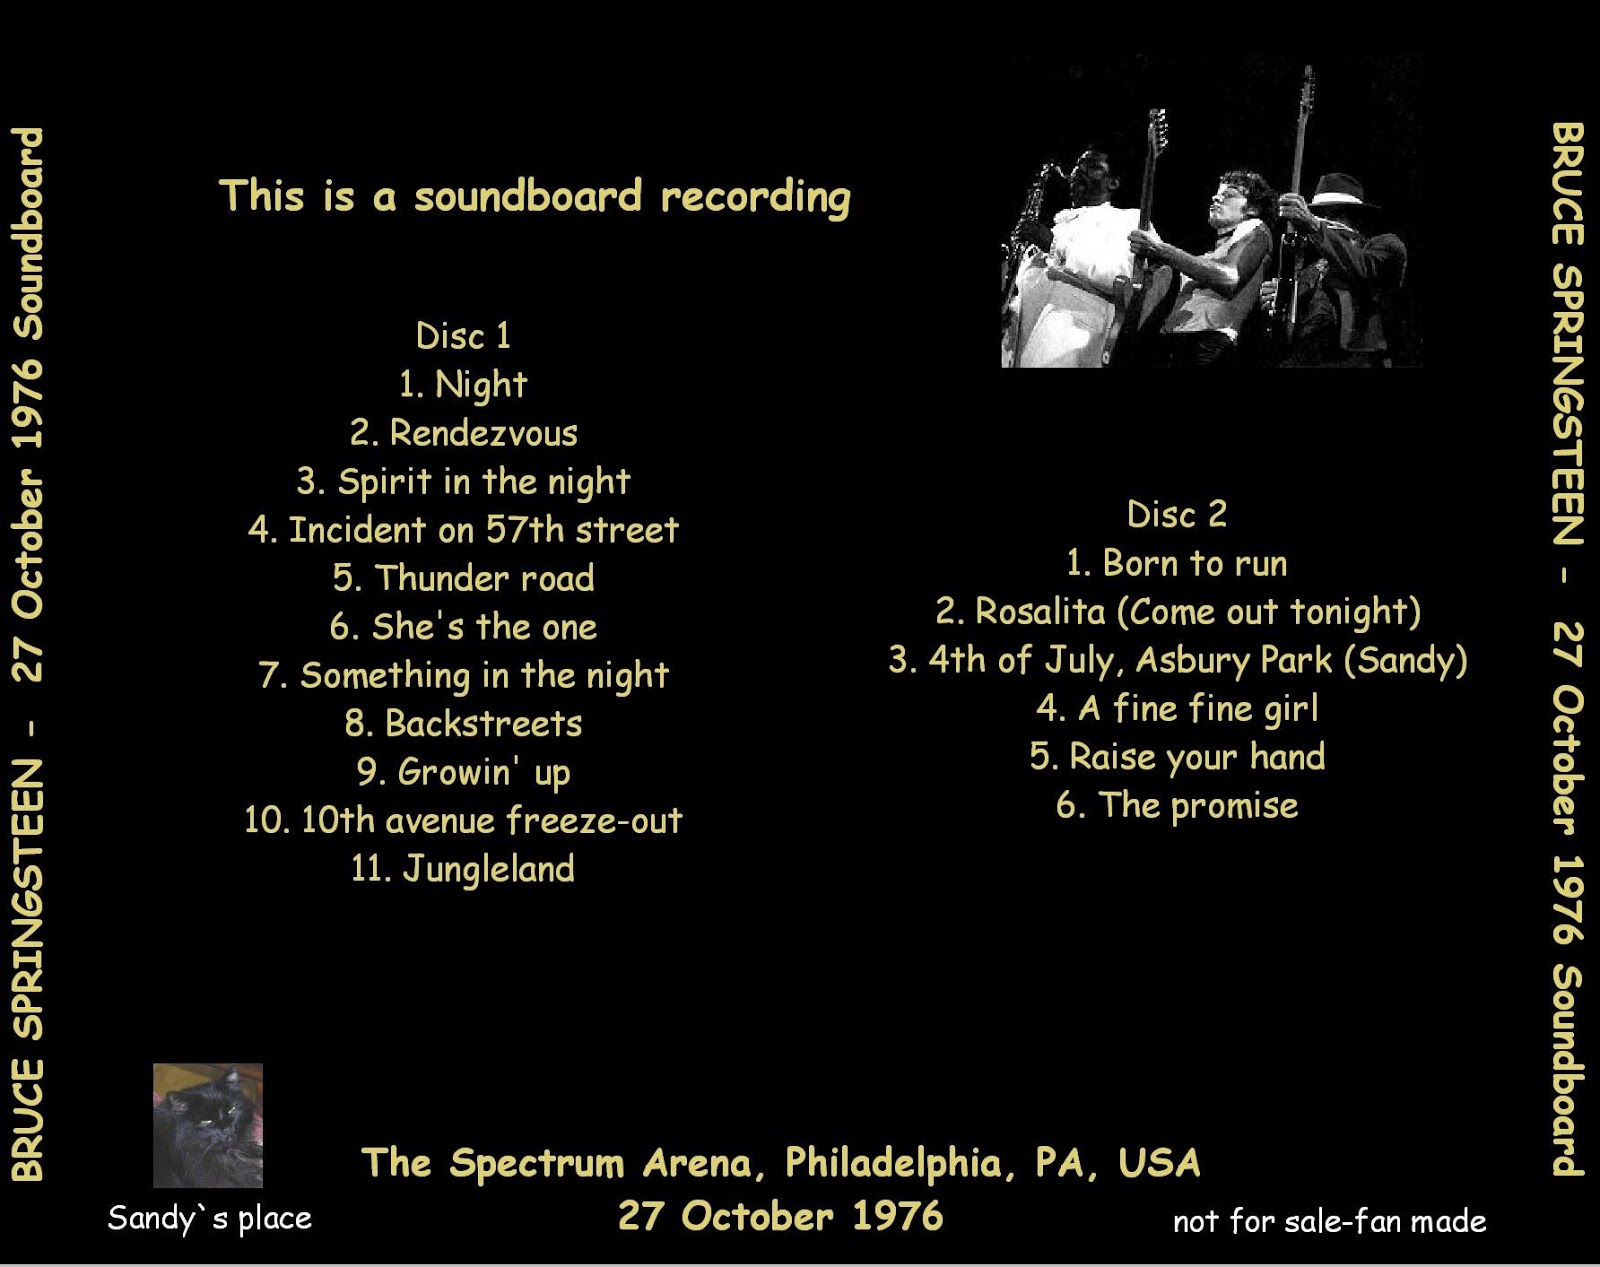 Plumdusty s page pink floyd 1975 06 12 spectrum theater philadelphia -  Soundboard Flac Spectrum